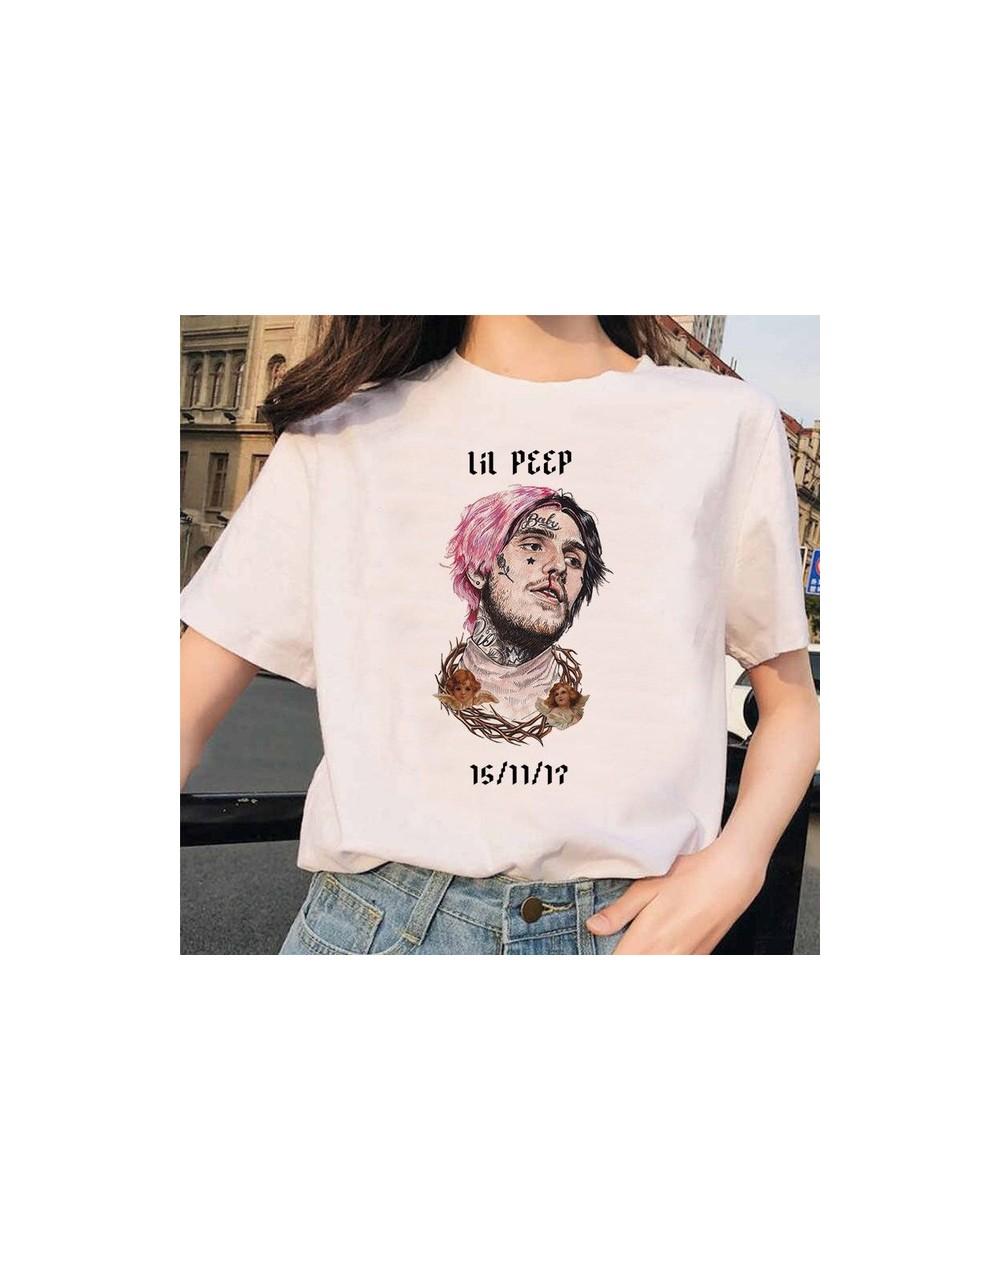 Rapper Lil Peep T Shirt Rap Hip Hop LilPeep Girl Tshirt Women Harajuku 90s Korean Vintage Tumblr T-shirt Graphic Tee Tops Fe...